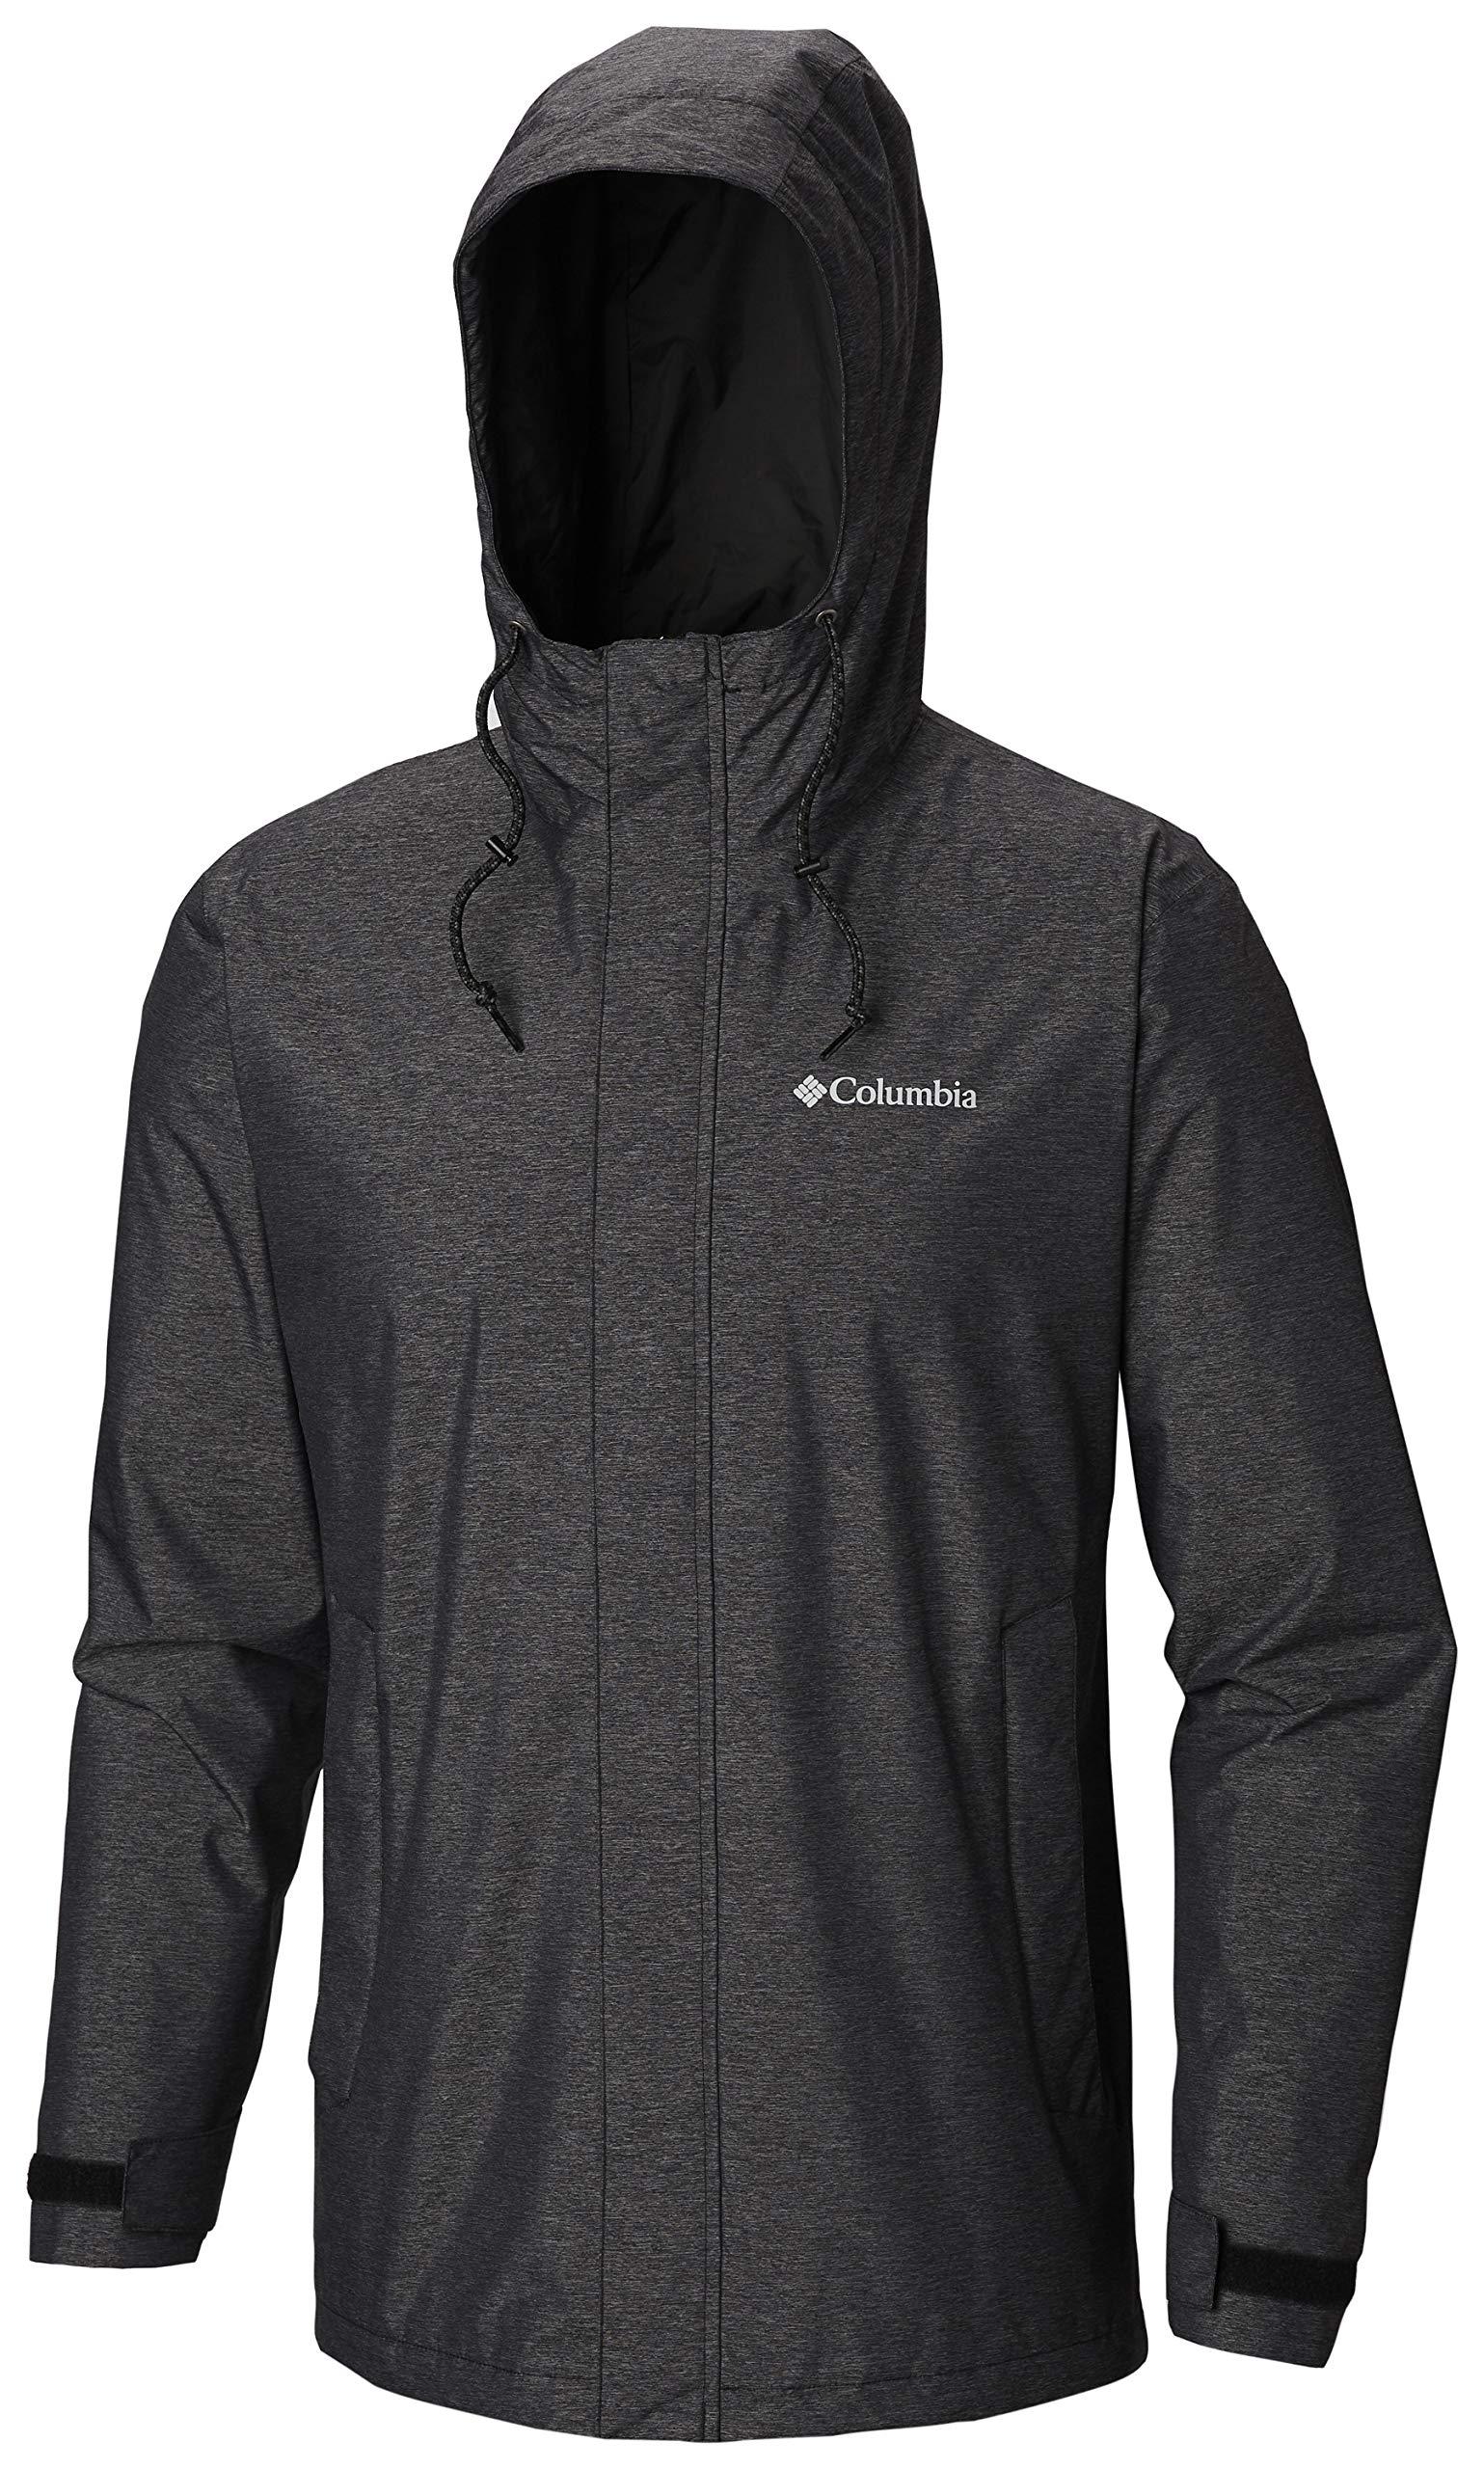 Columbia Men's Norwalk Mountain Jacket, Black Heather, Large by Columbia